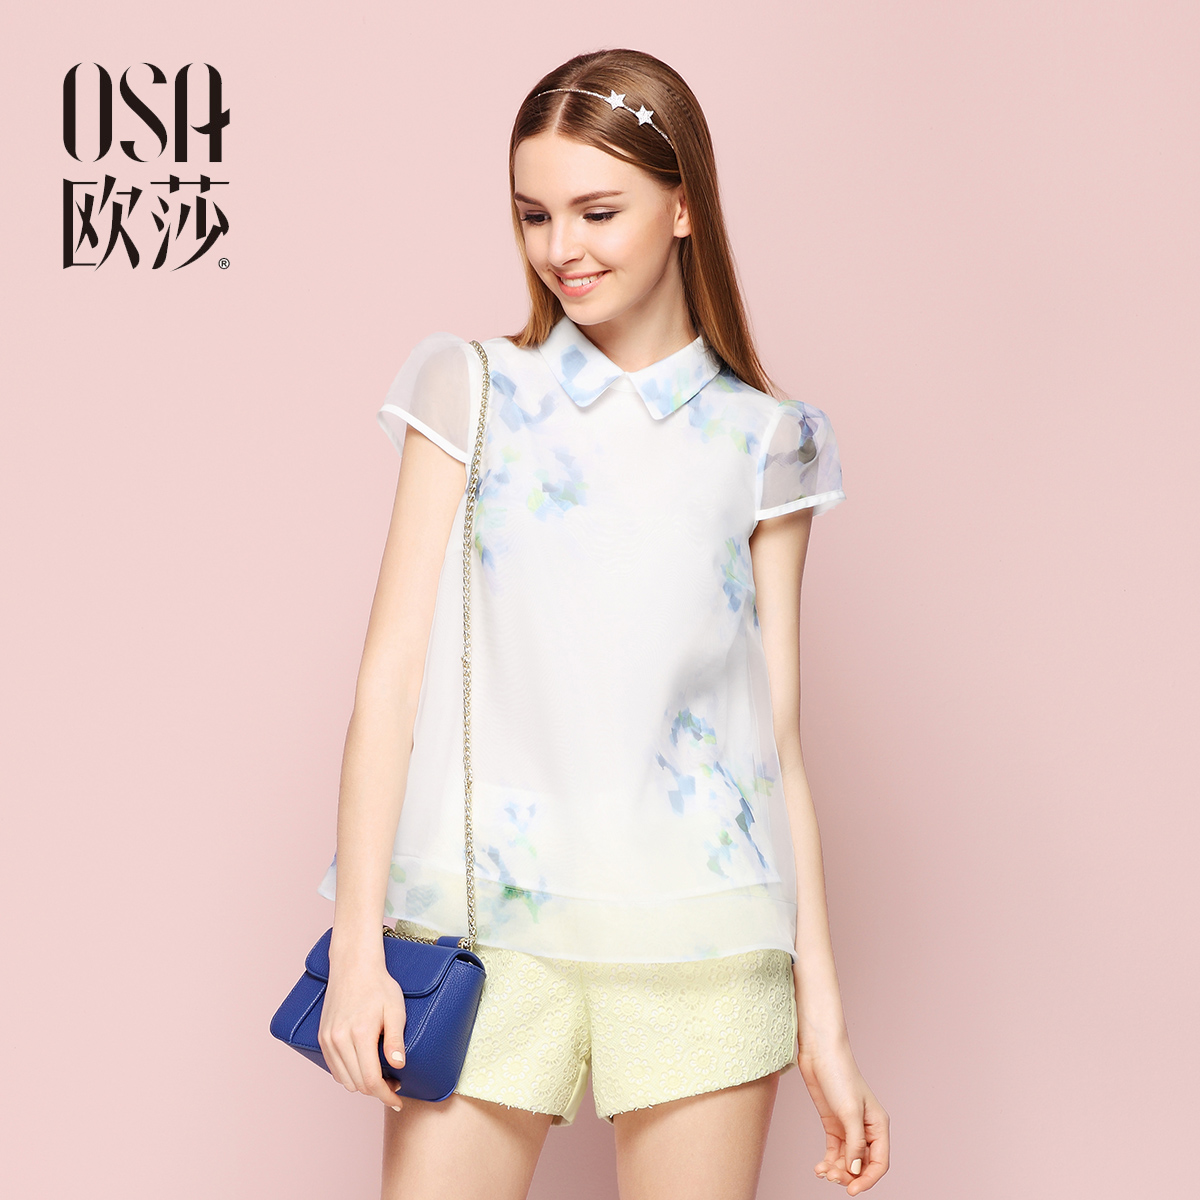 женская рубашка OSA sc505016 2015 платье osa kq424004 2015